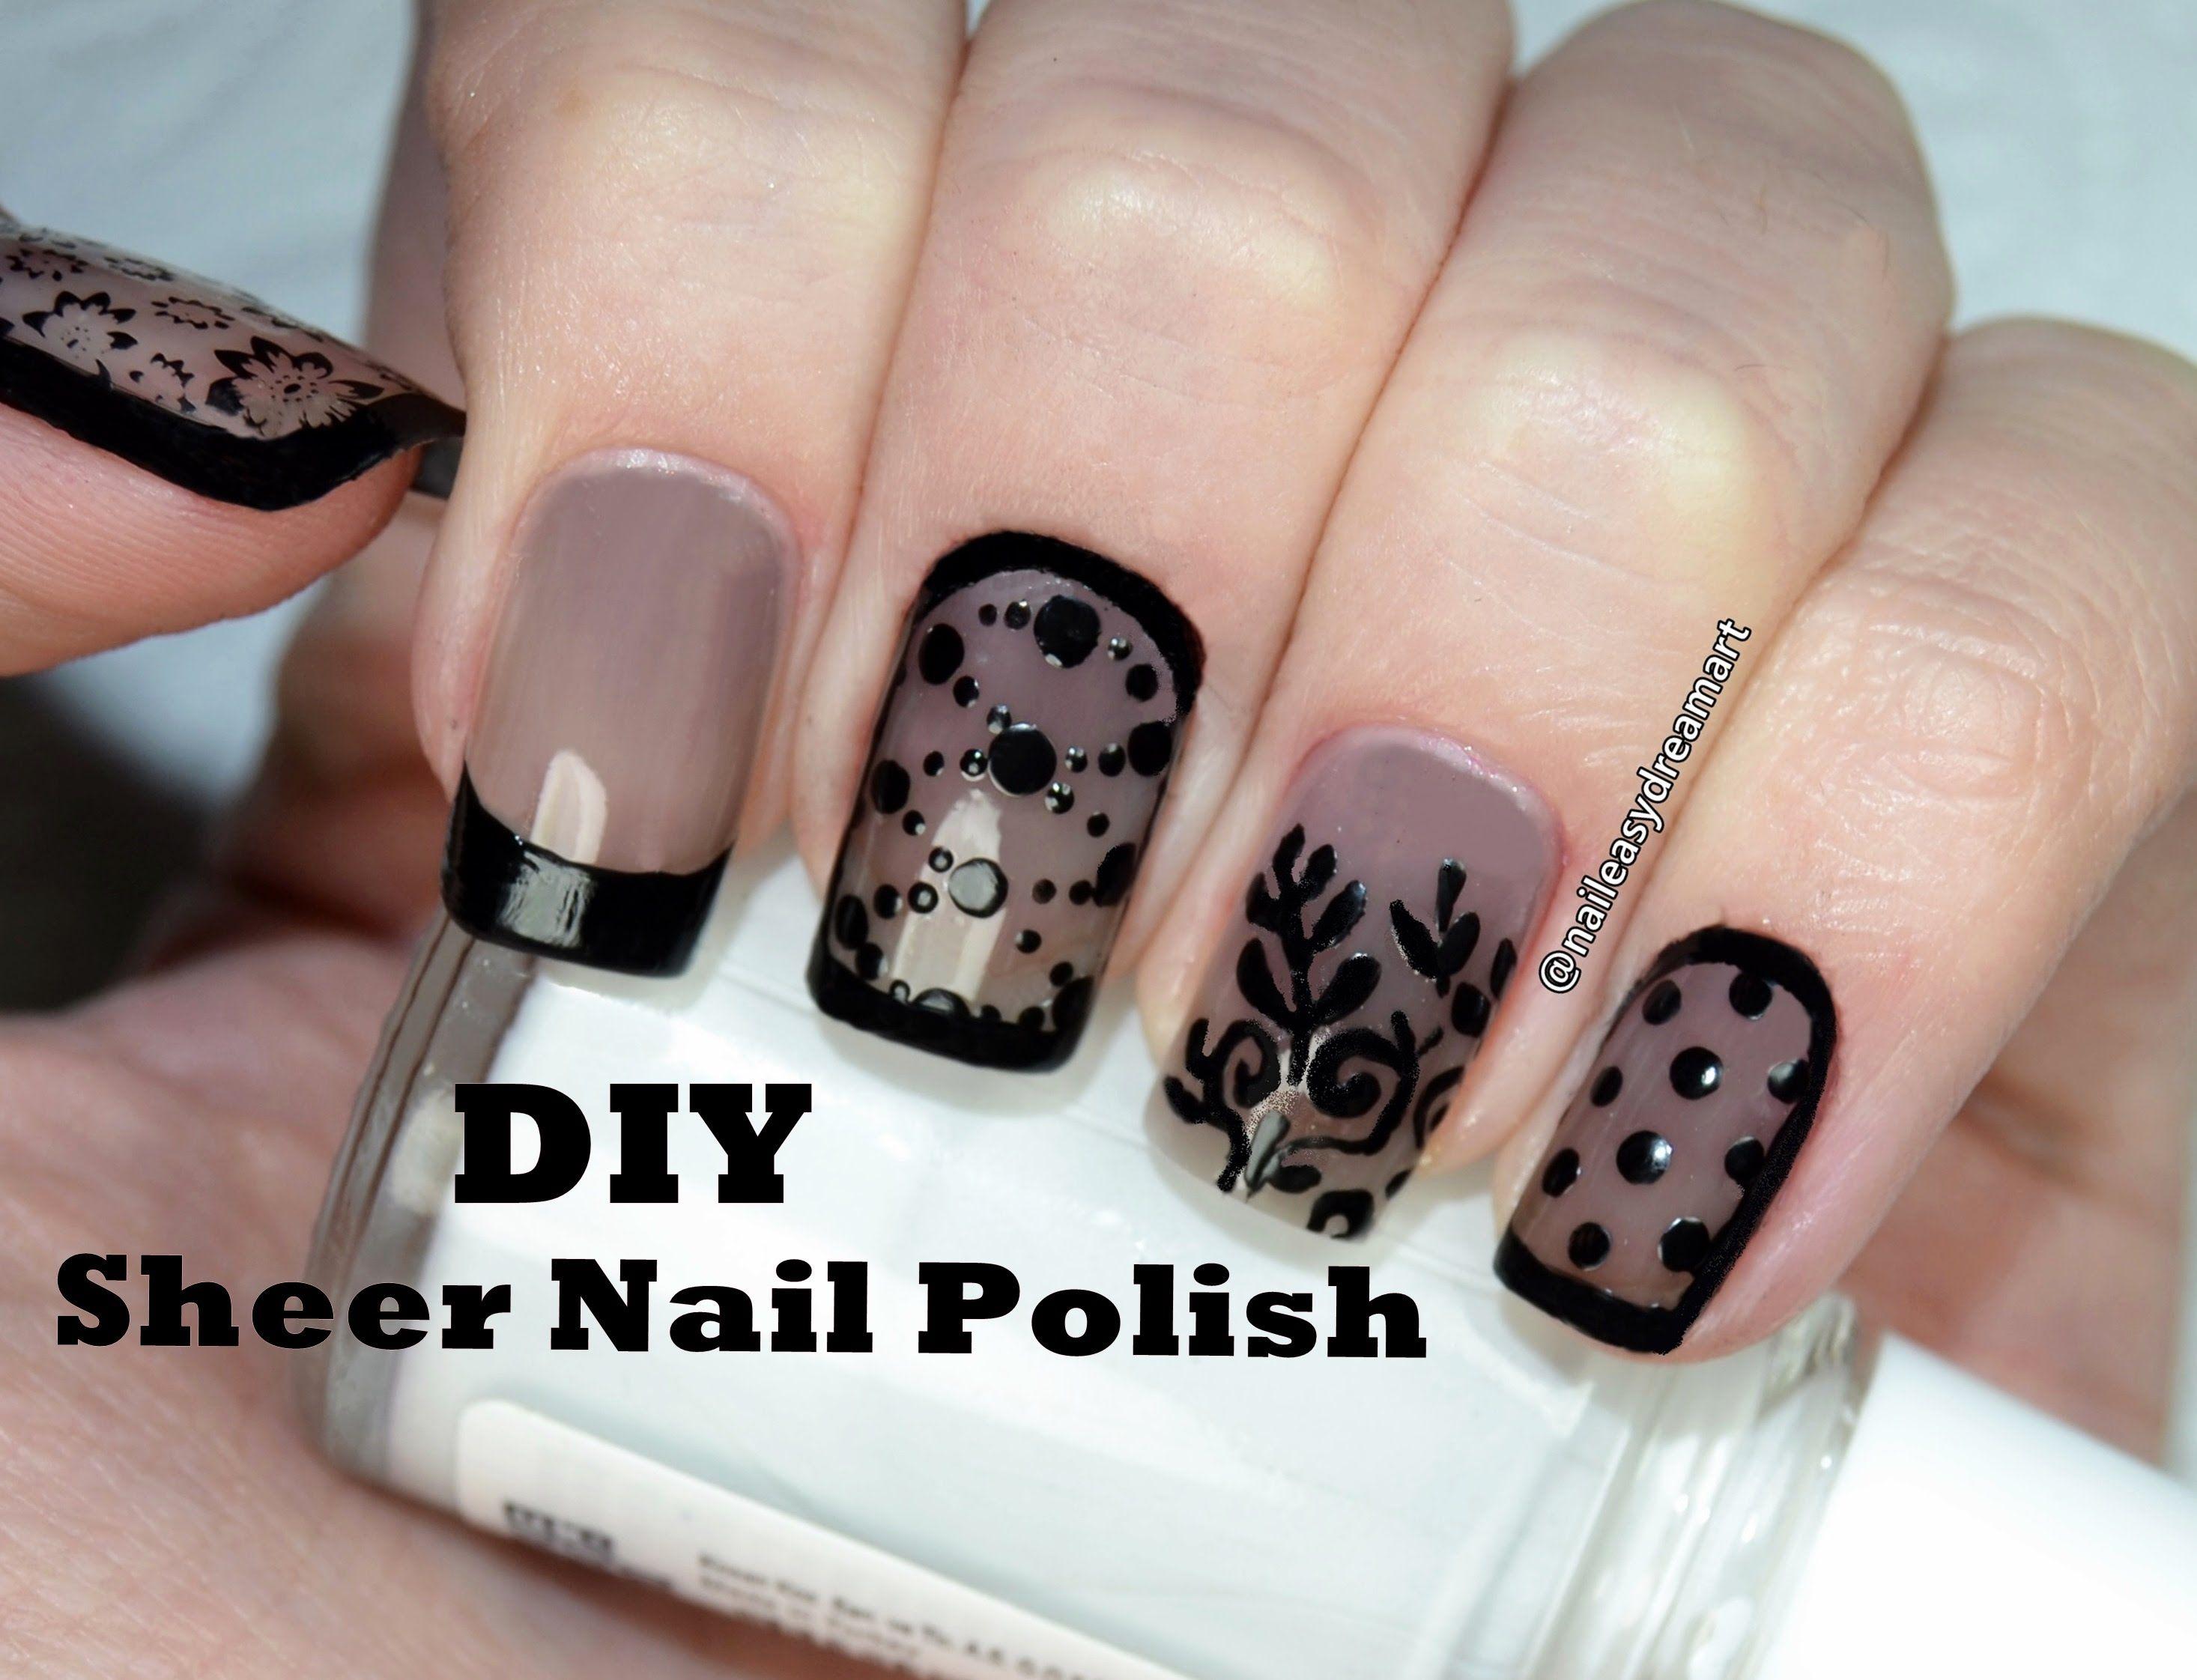 How to DIY Sheer Tint Nail Polish | 5 Designs | Прозрачный Дизайн ...